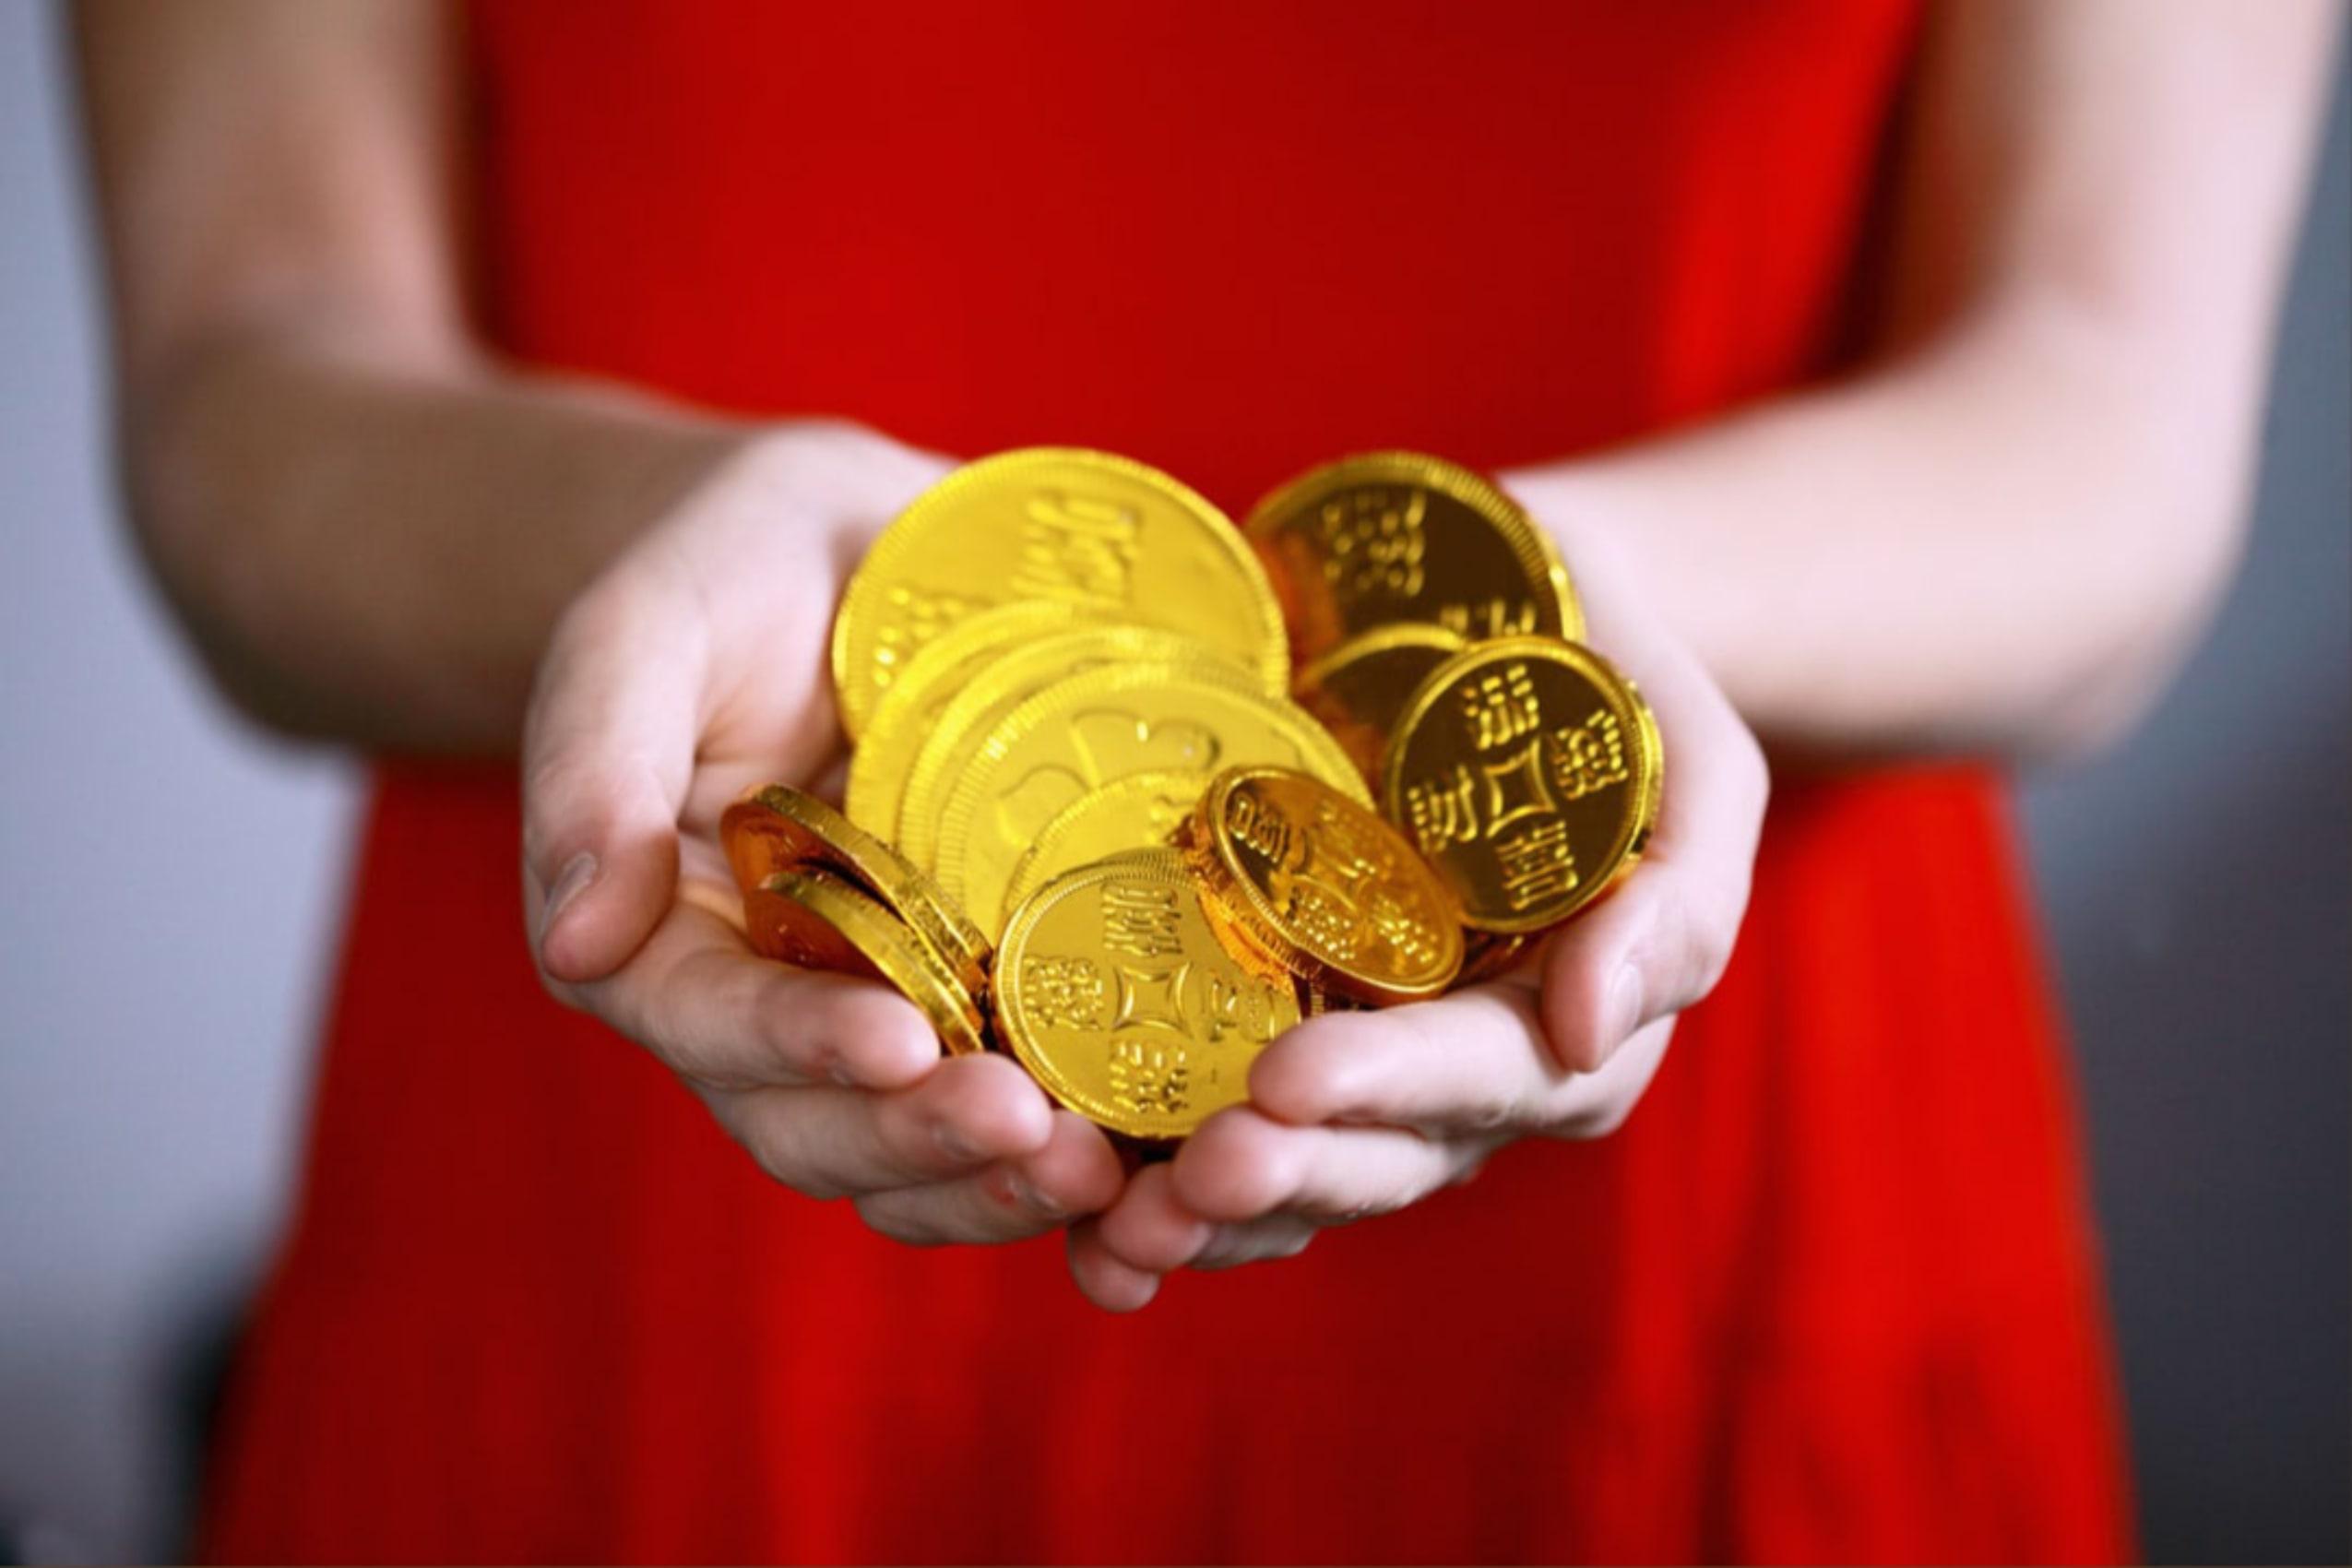 Asian Games 2018: Berapa Medali Emas yang Diperoleh China?